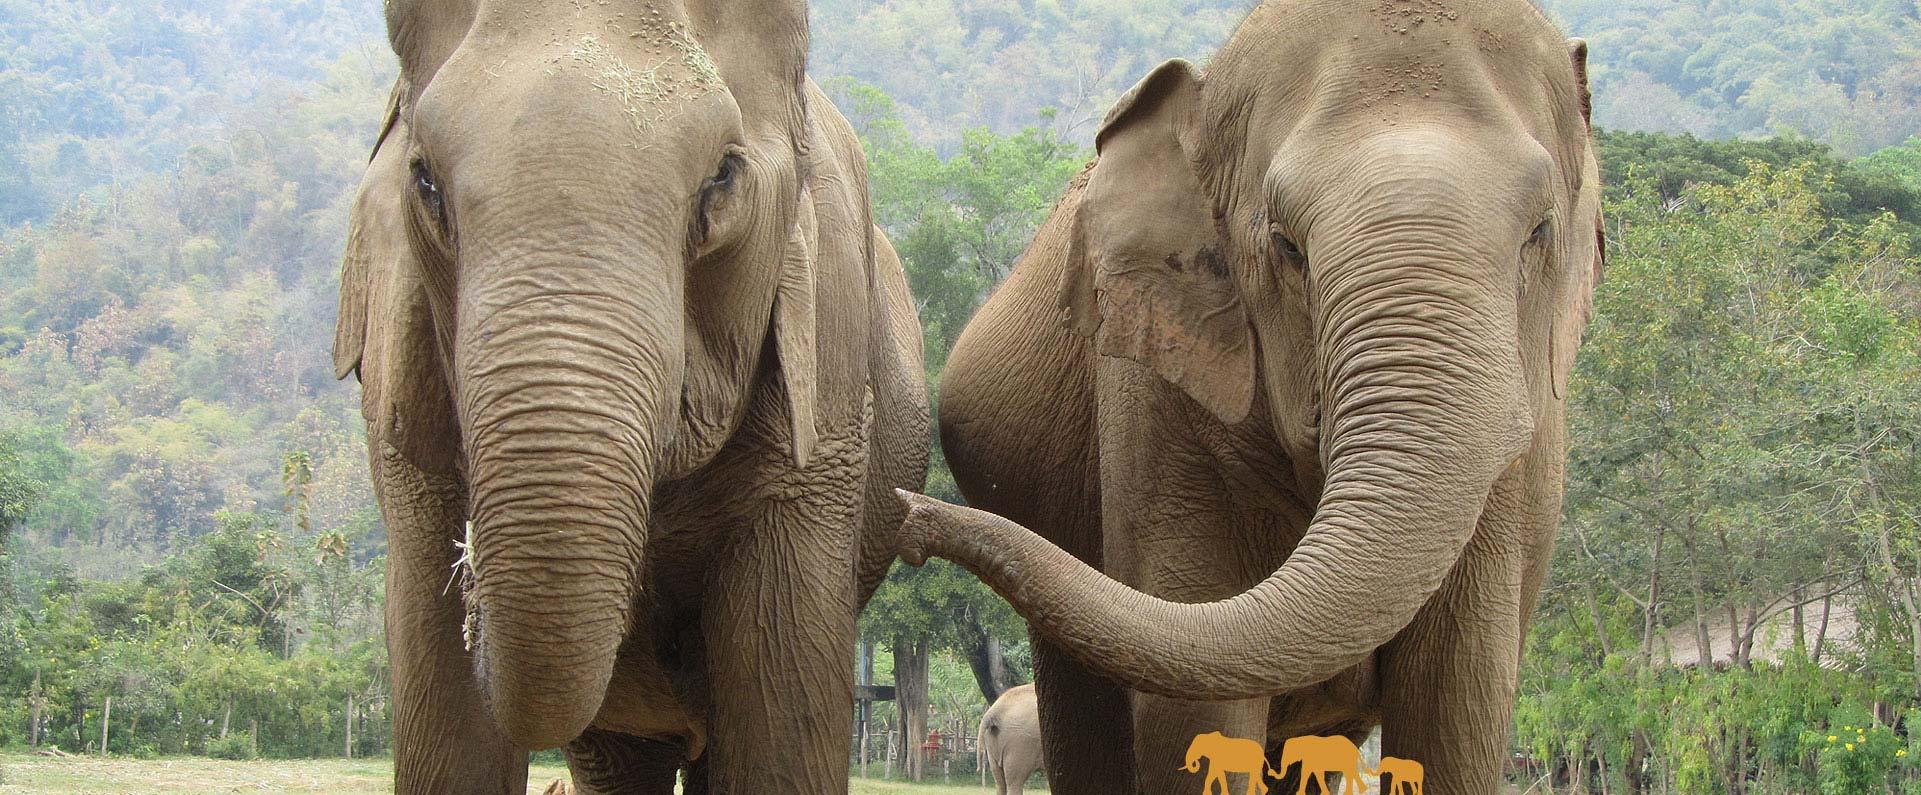 Elephant haven european elephant sanctuary - Image elephant ...